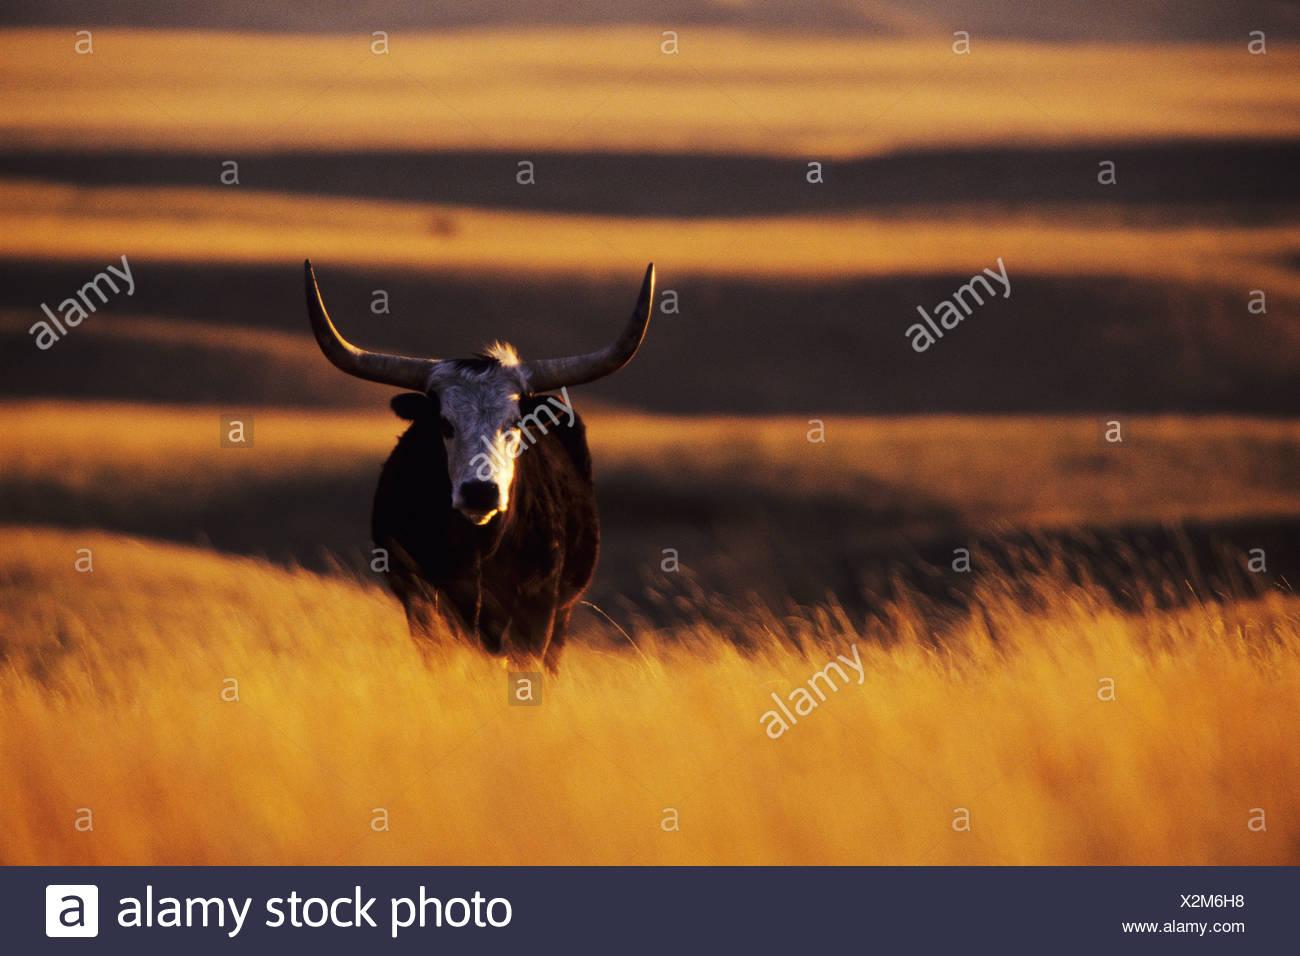 Longhorn steer near Mankota, Saskatchewan, Canada - Stock Image